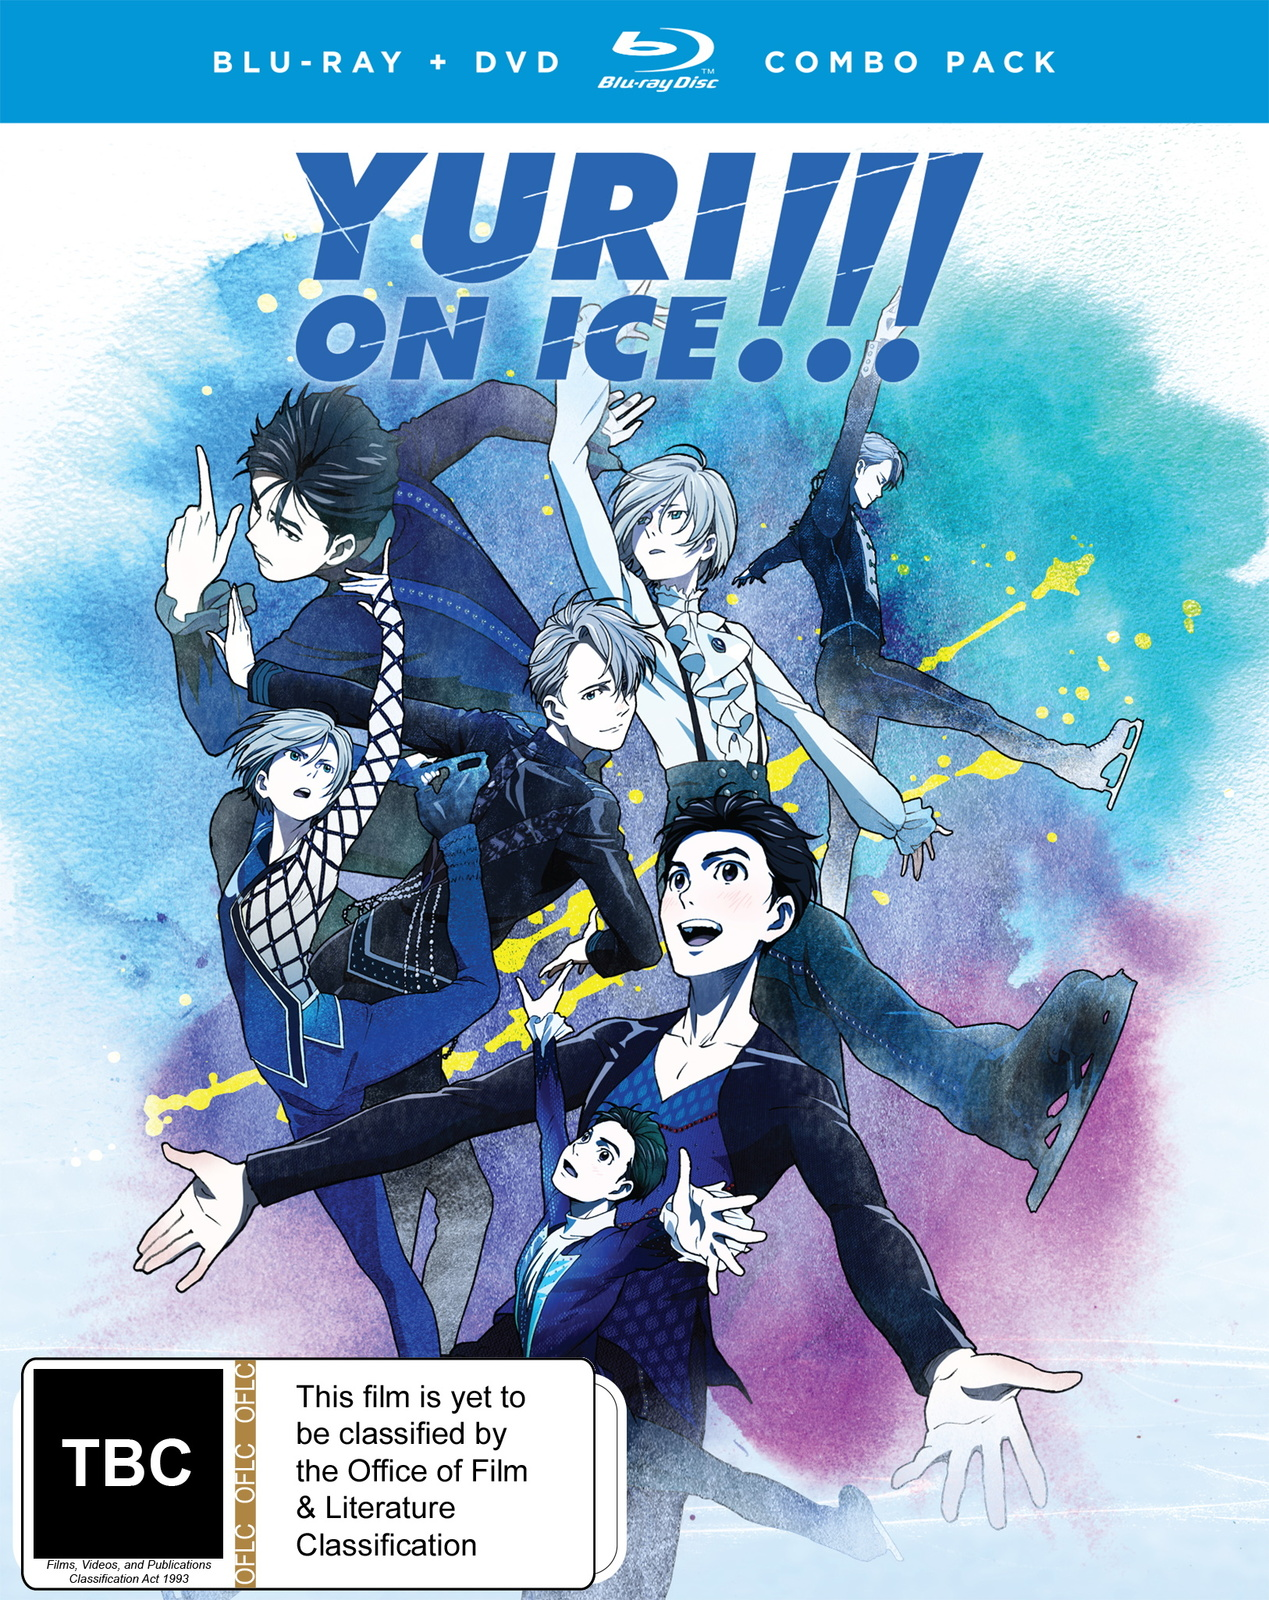 Yuri!!! On Ice Complete Series Dvd / Blu-ray Combo on DVD, Blu-ray image